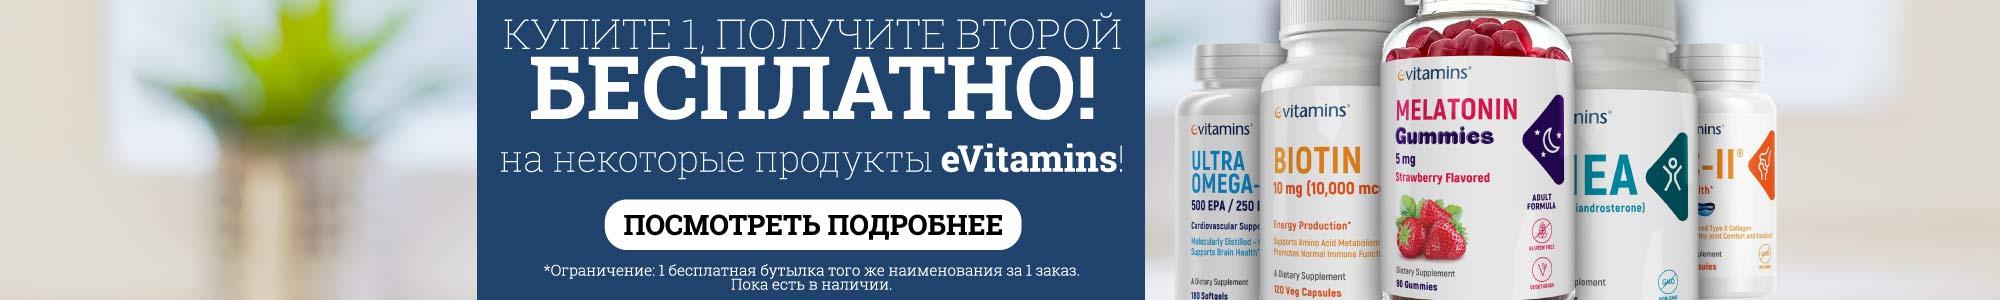 eVitamins - Buy One Get One